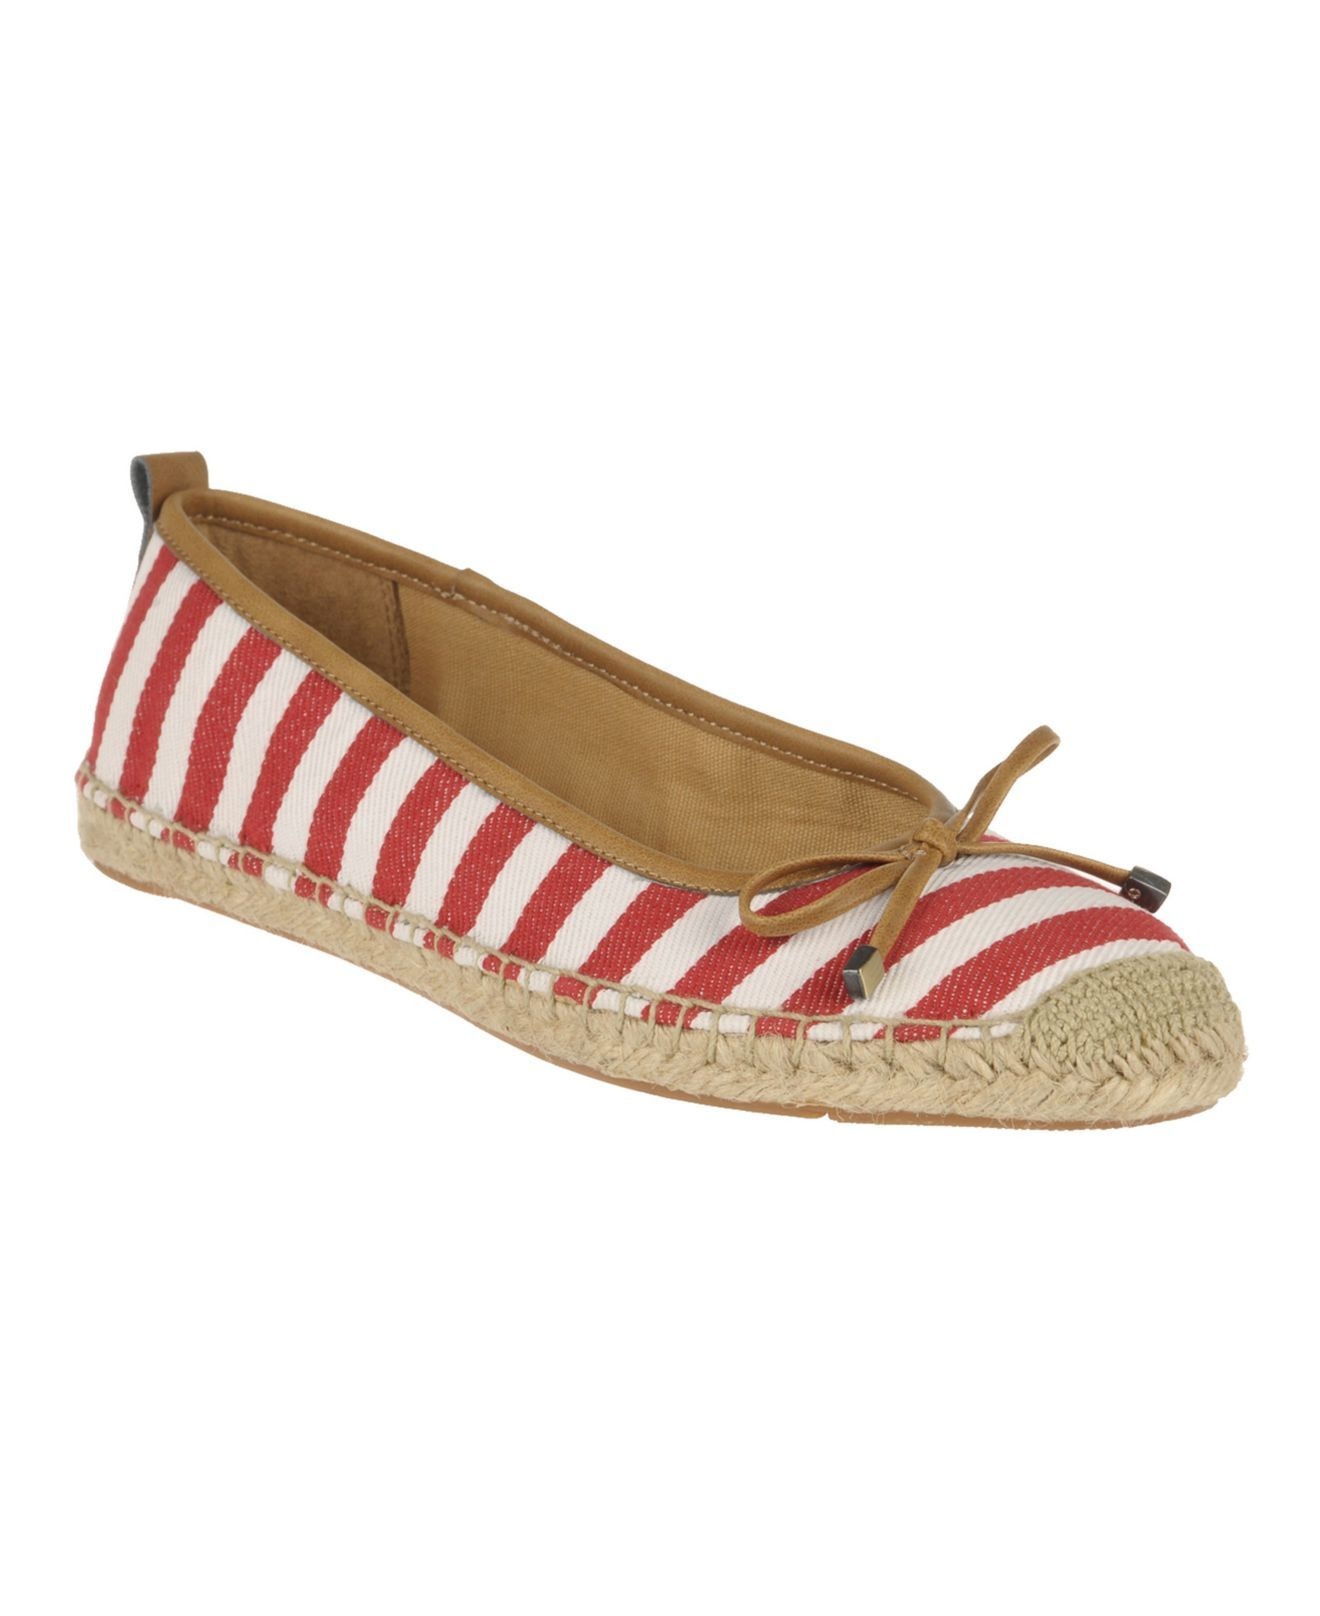 Naturalizer Shoes, Sarah Espadrille Flats - Comfort - Shoes - Macy's